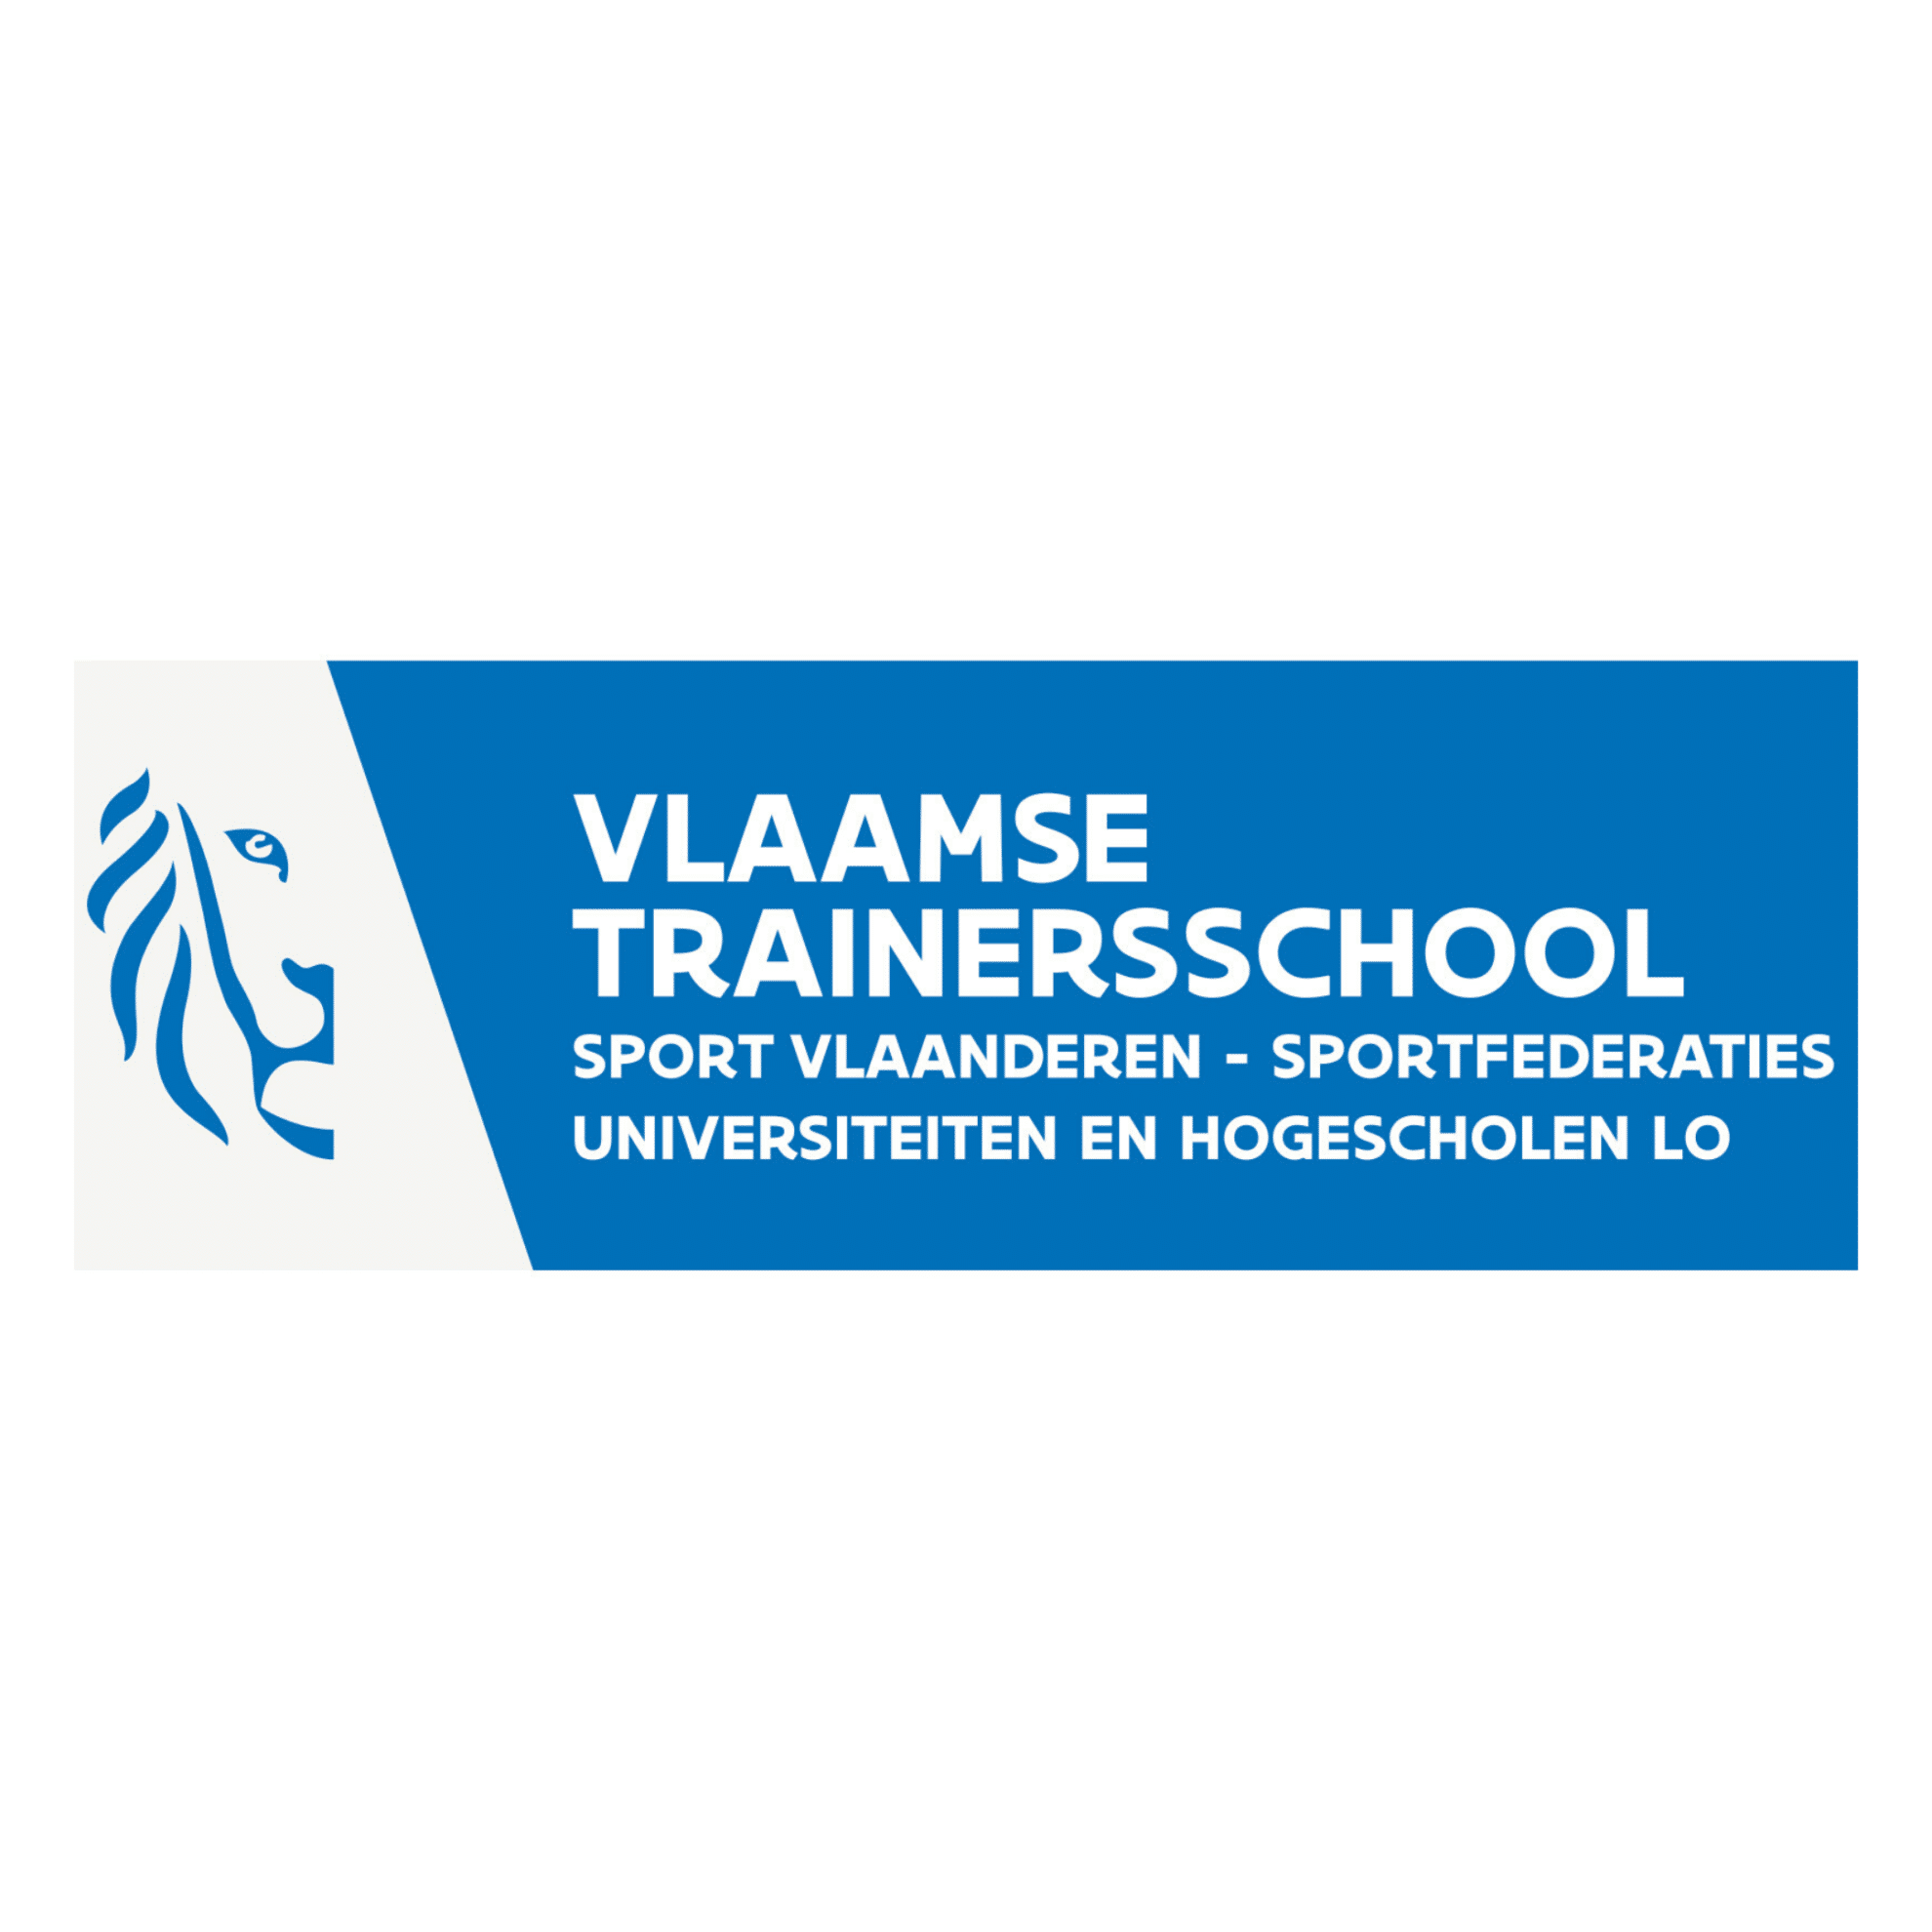 Vlaamse trainerschool